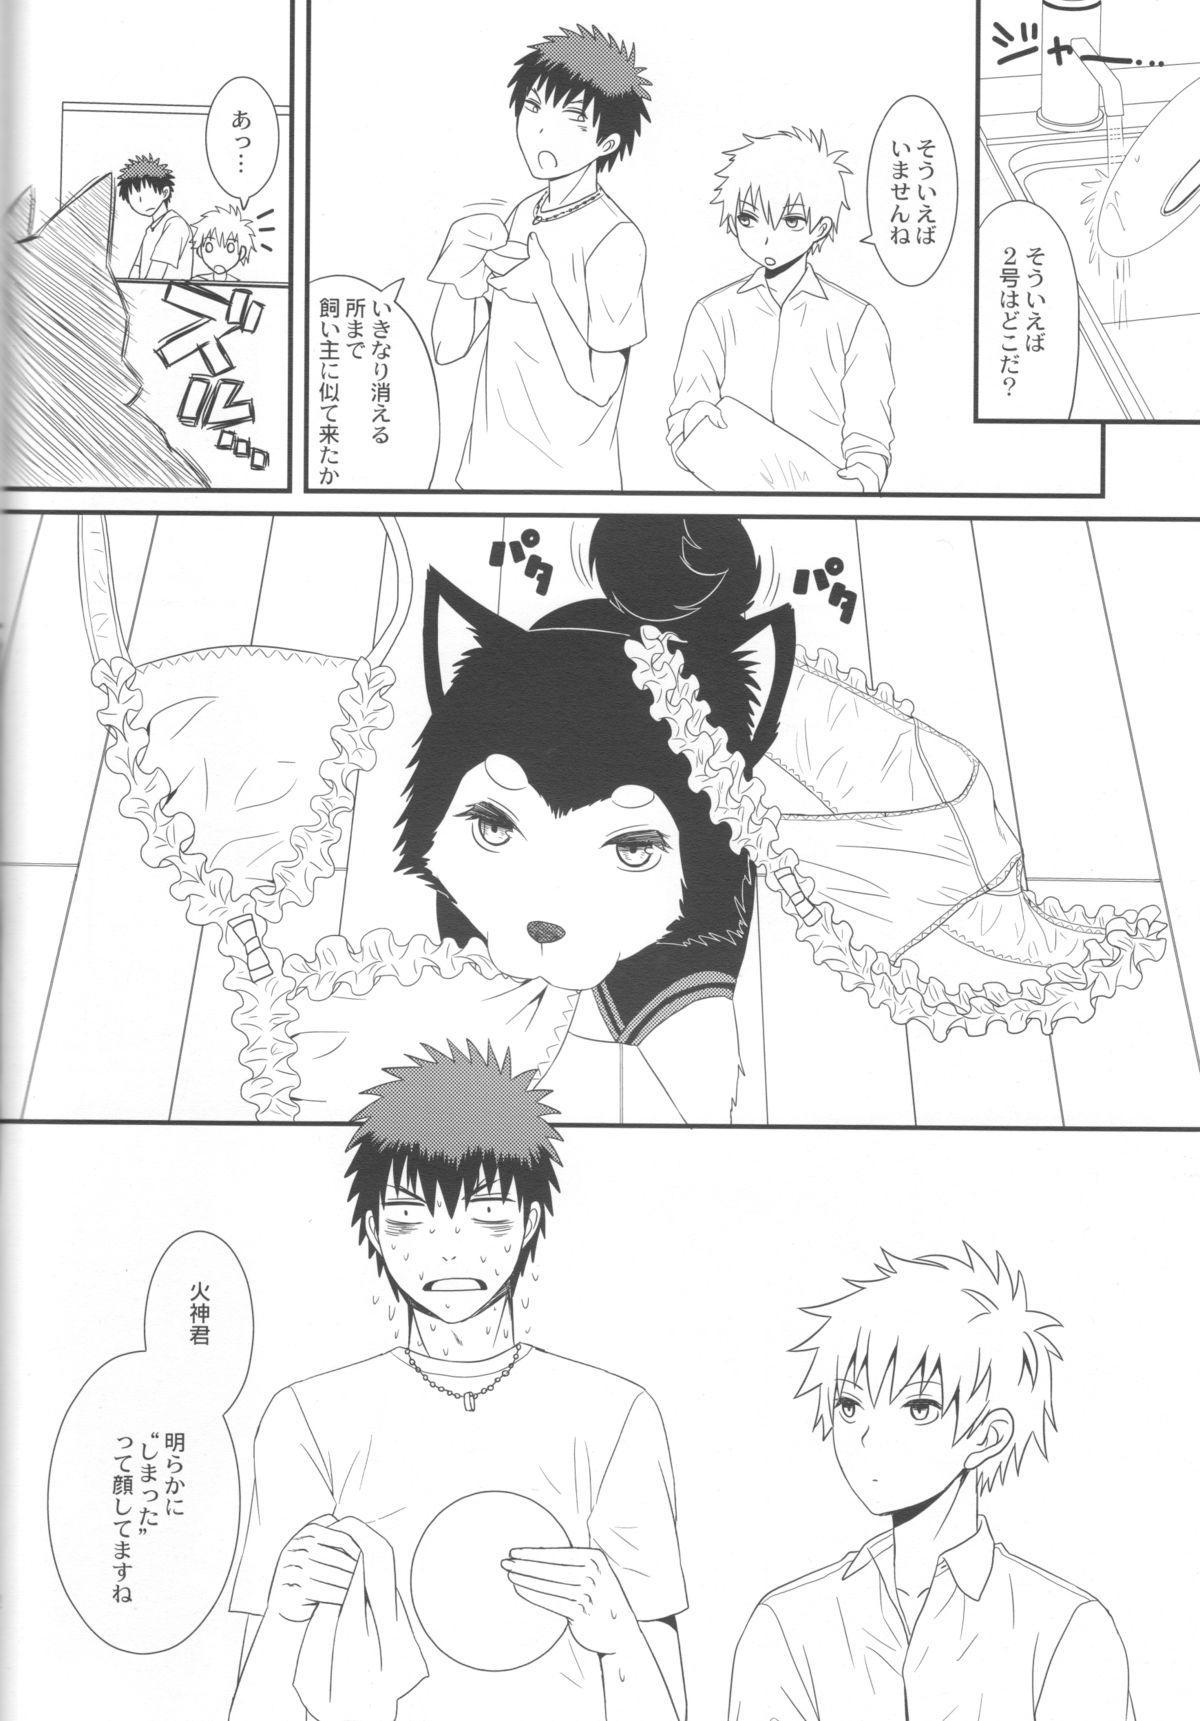 Kuroko to Kagami to Tokidoki Nigou to 10